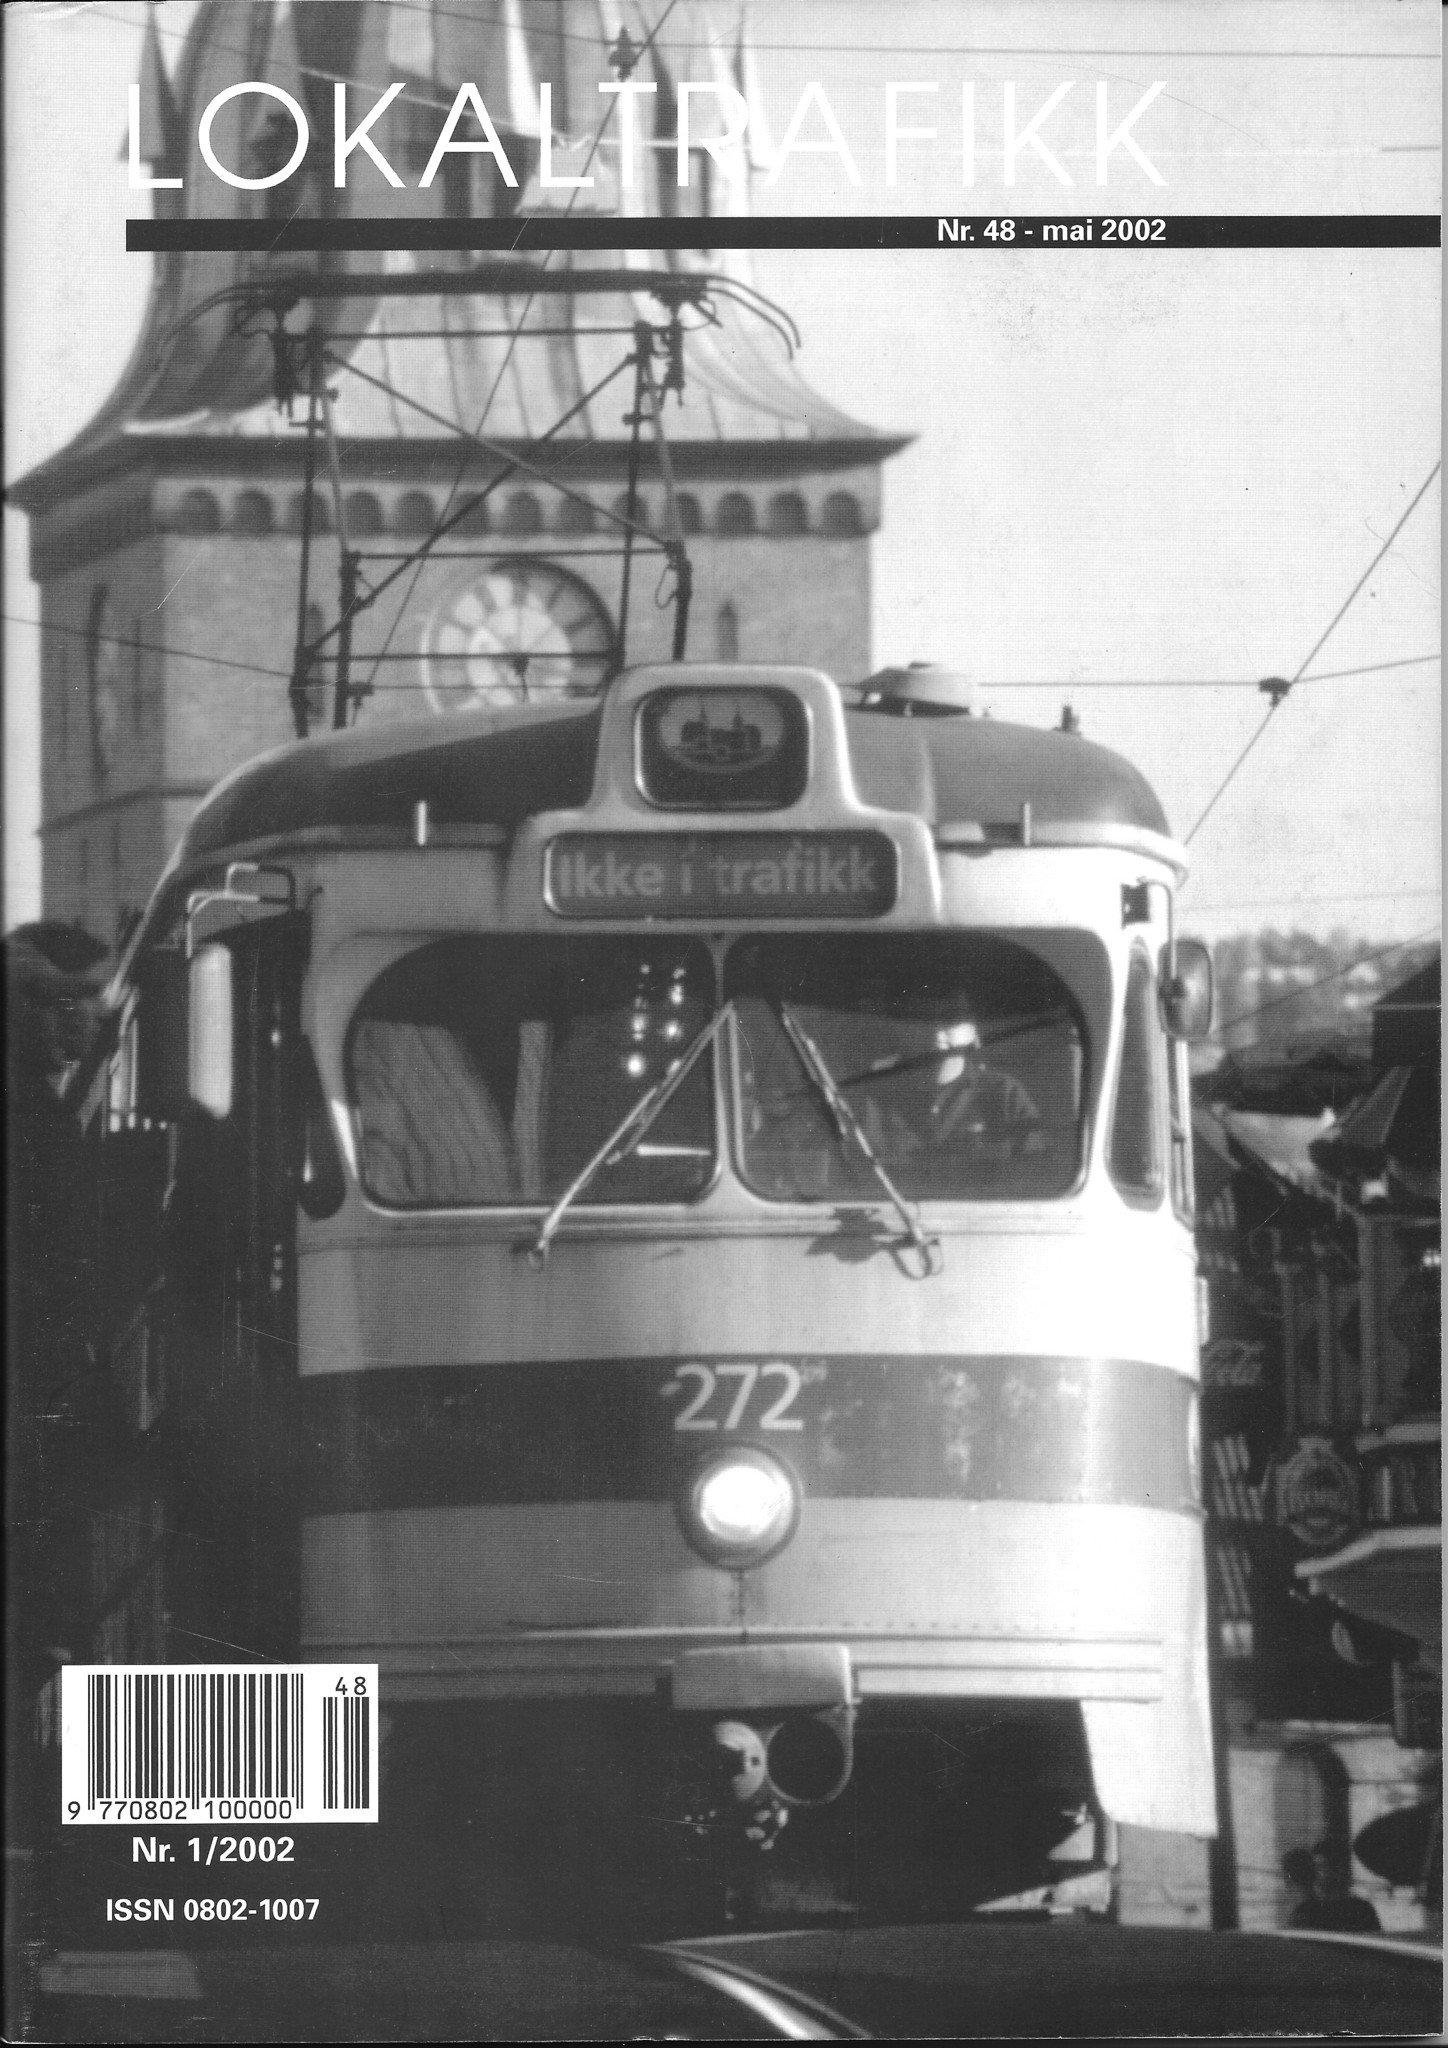 Lokaltrafikk #048